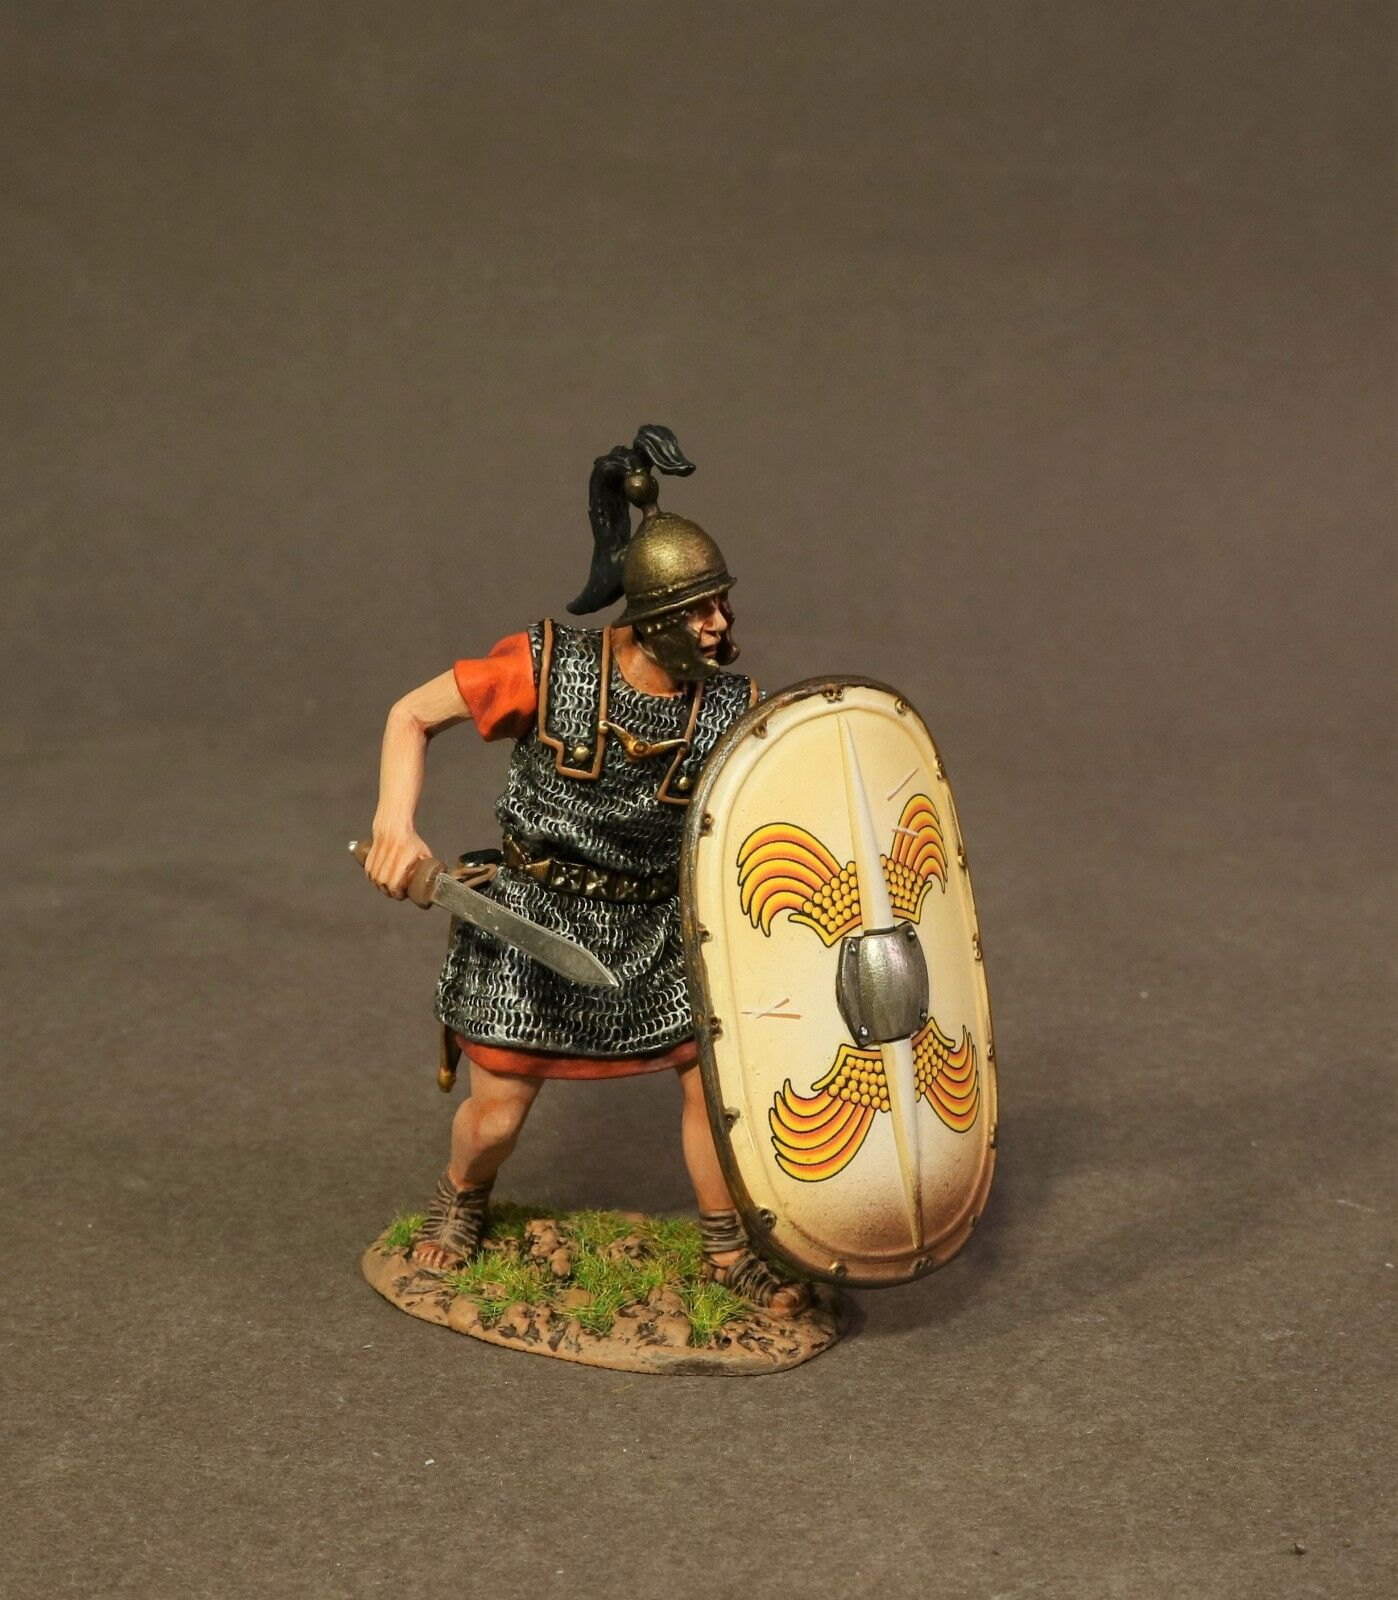 JOHN JENKINS ROMAN EMPIRE AGE OF ARTHUR RR-07W LEGIONNAIRE AT THE READY MIB